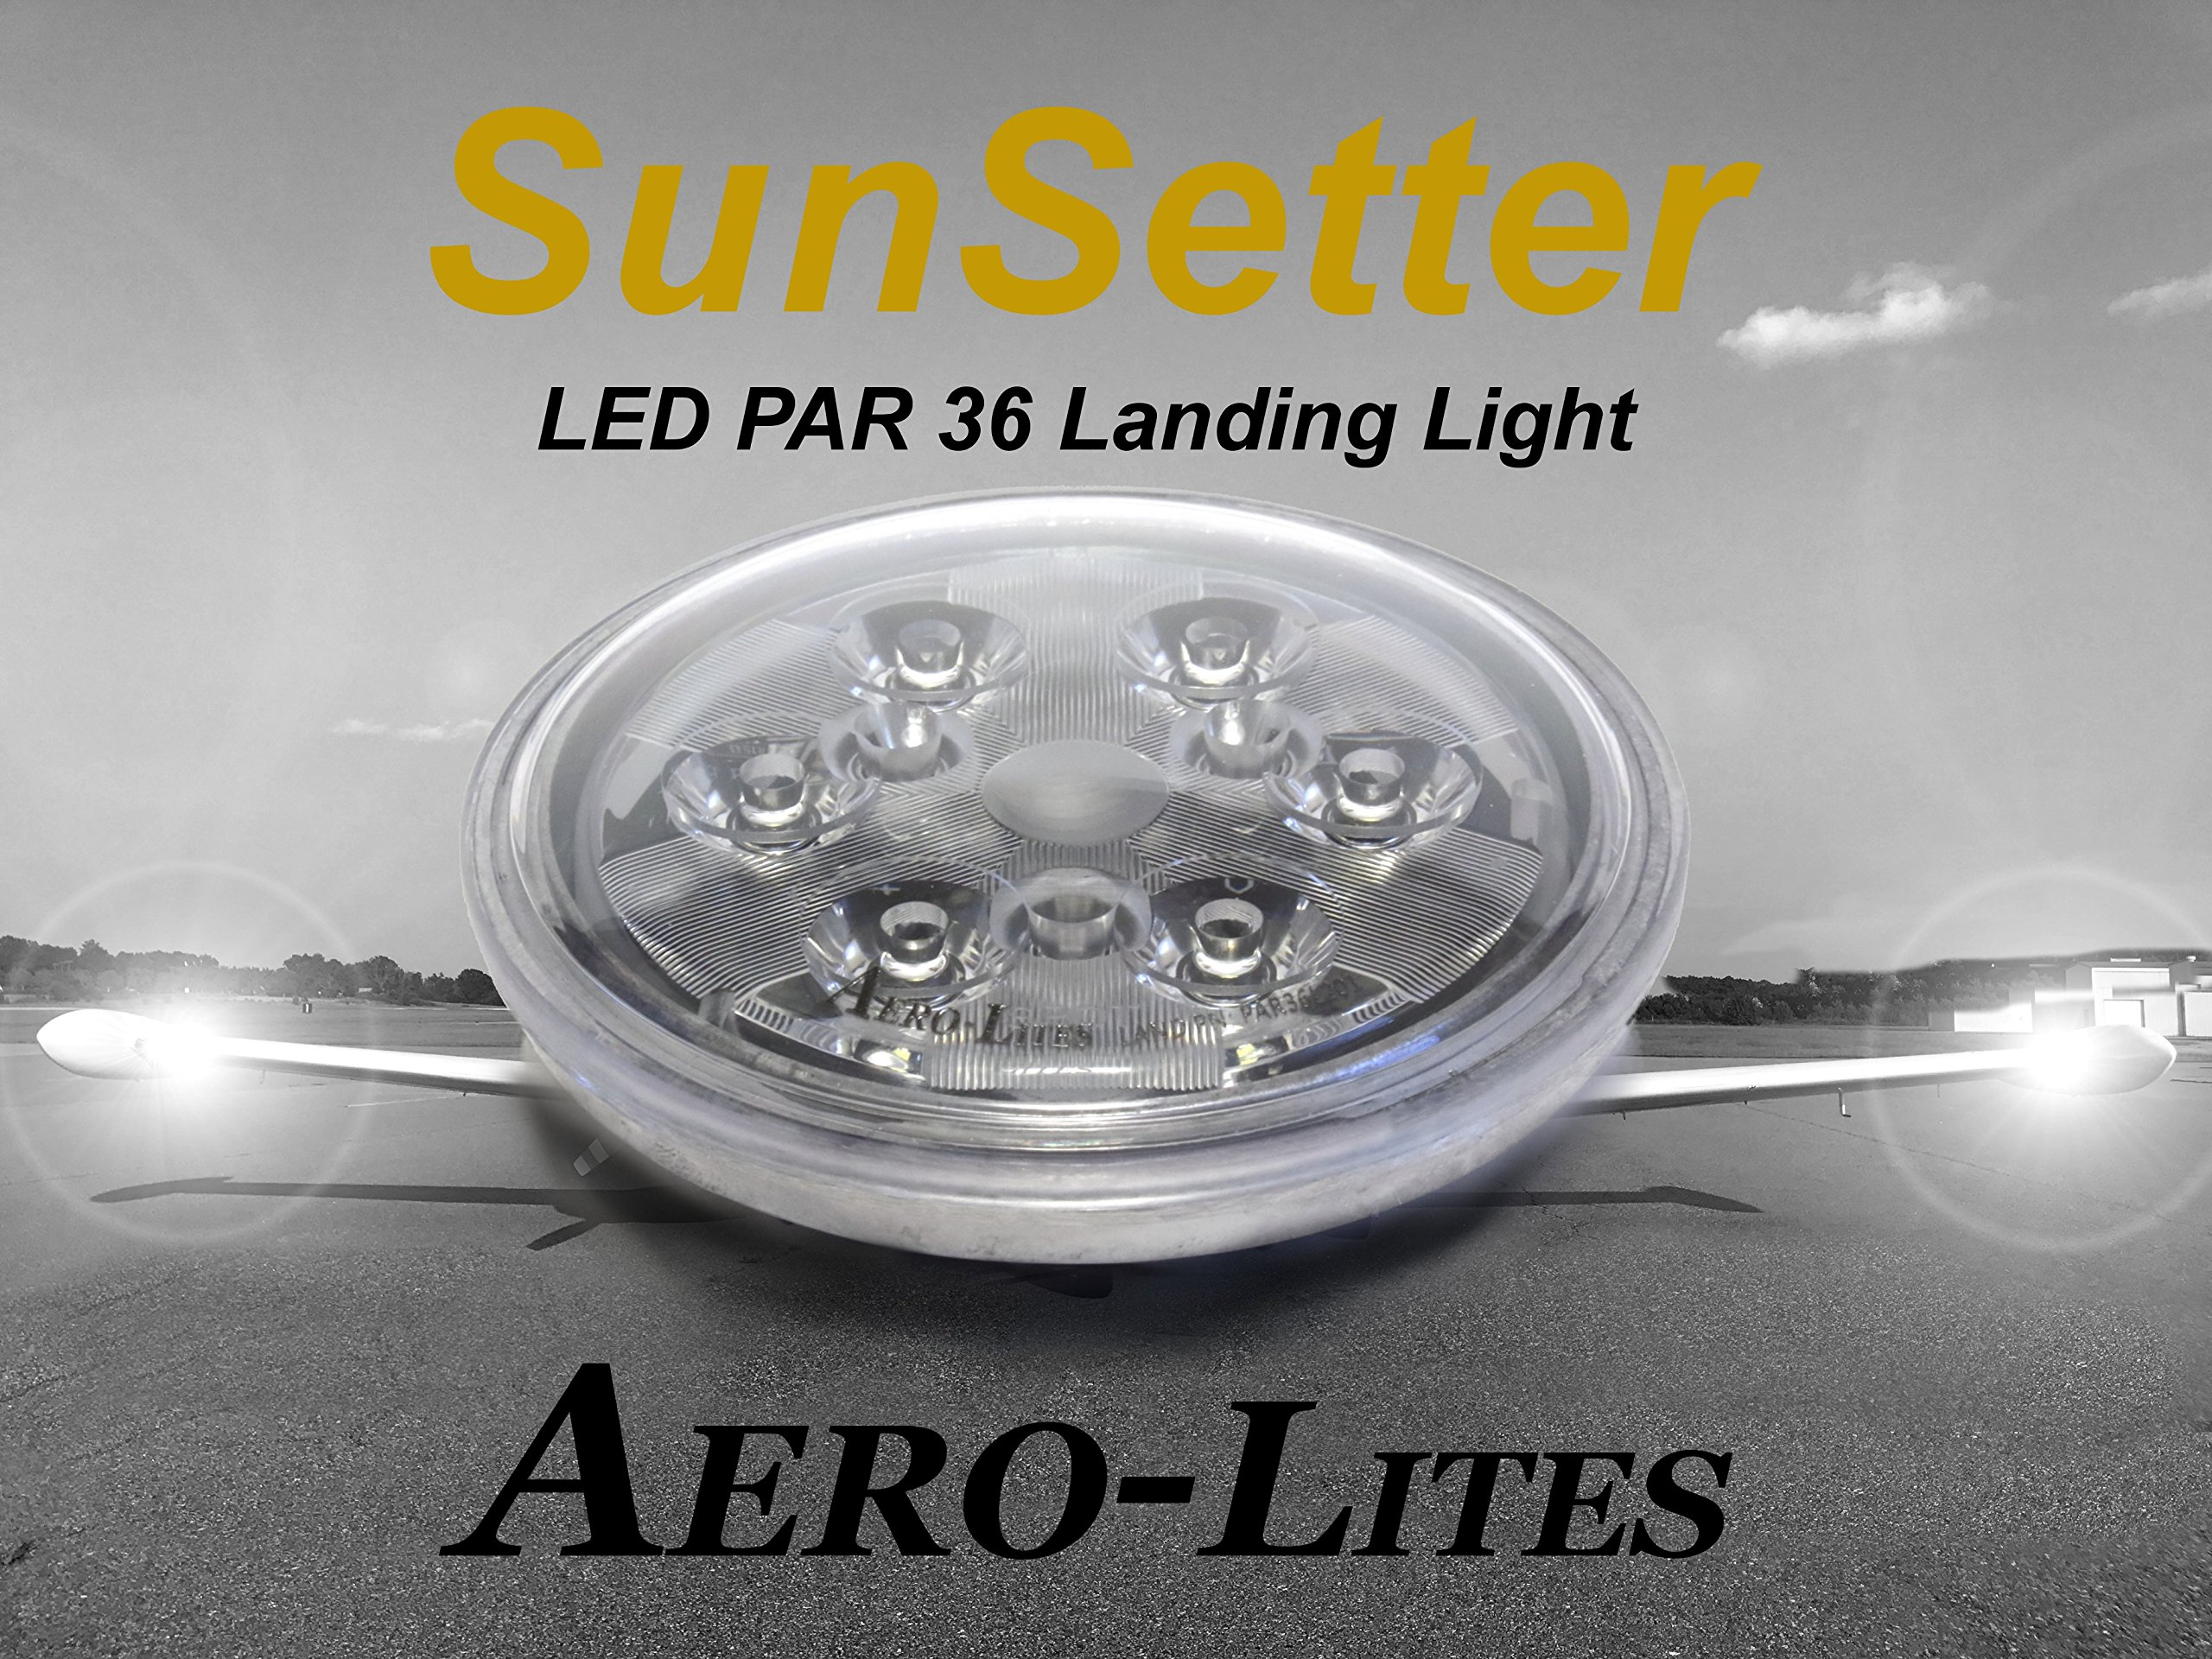 Aero-Lites LED Landing Light - PAR36 Drop-in Replacement for GE4509 14-28 volt by Aero-Lites